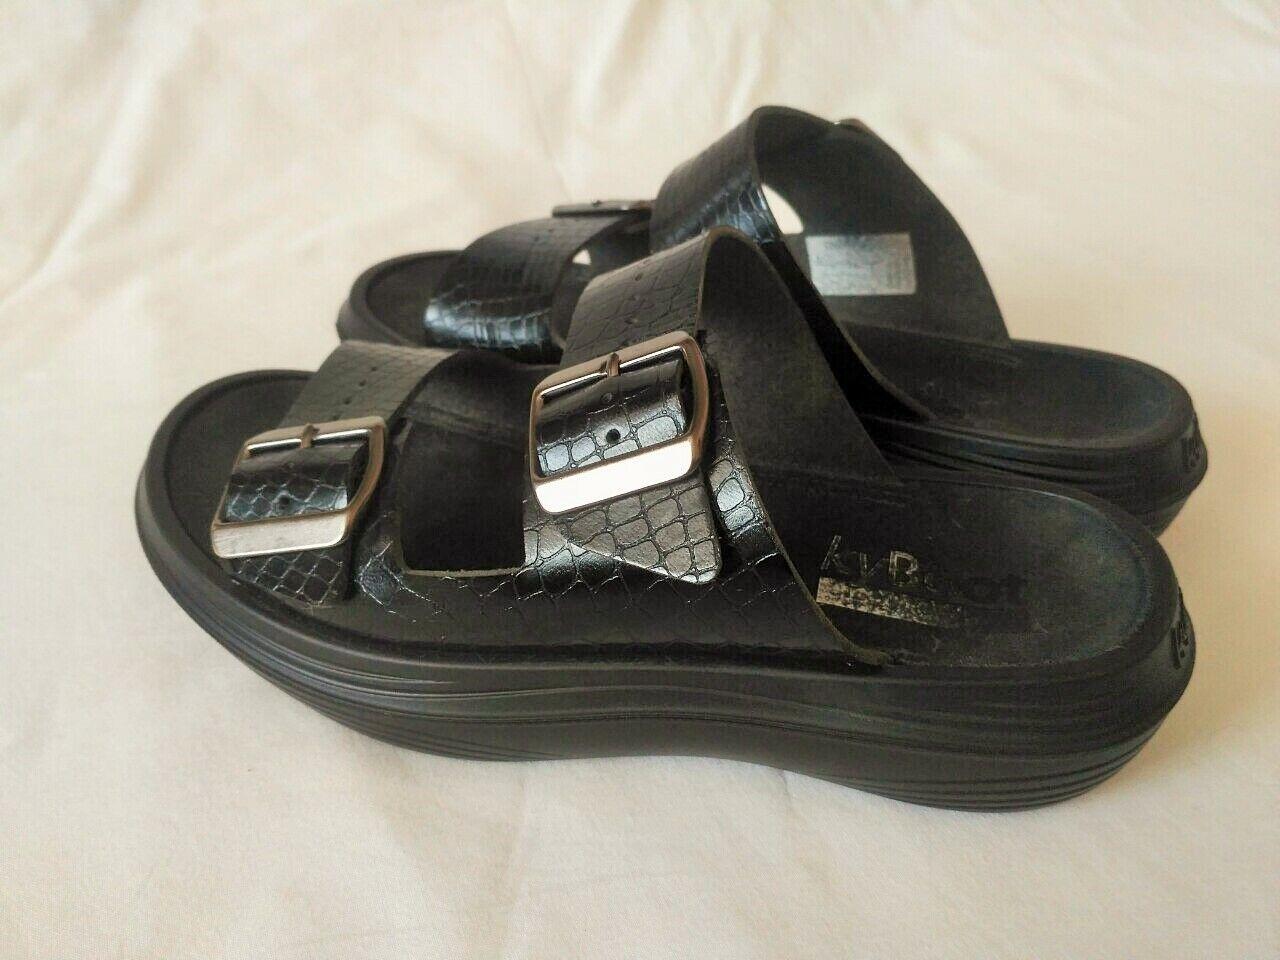 Kybun   kybota Air para caminar, sandalias para mujeres, 36 1   3 EU   6.5 US